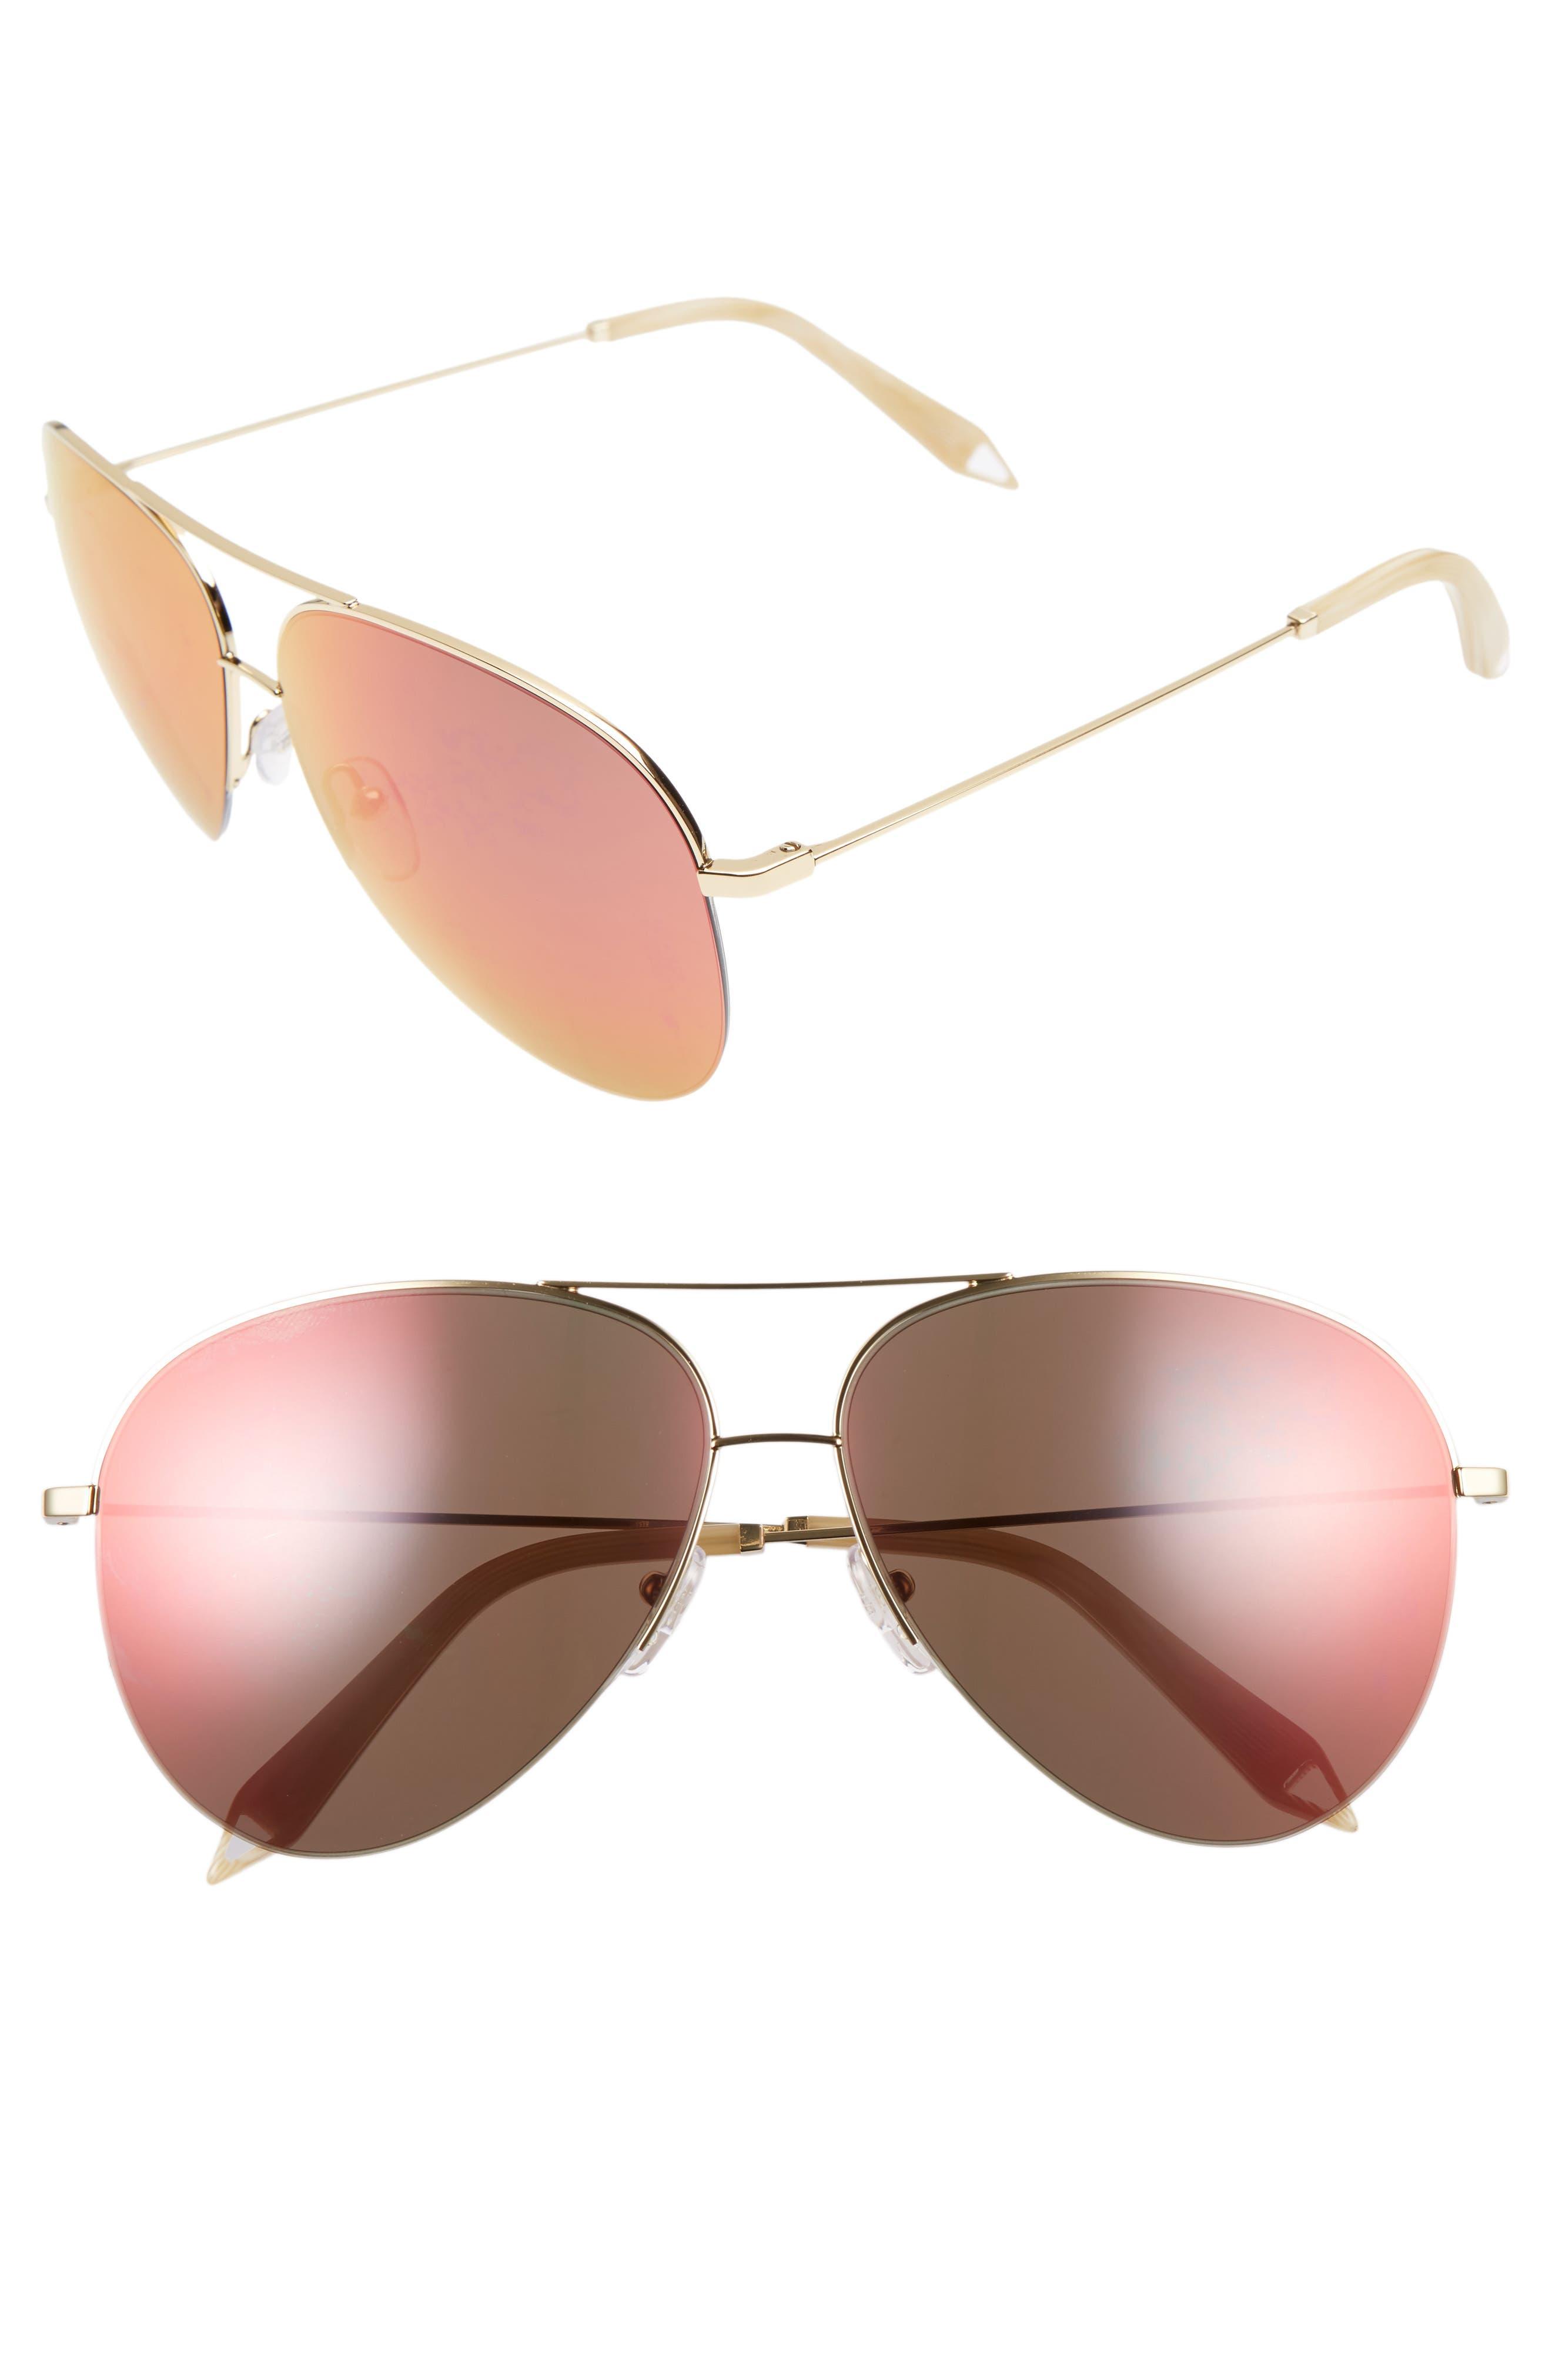 Victoria Beckham Classic Victoria 62mm Sunglasses